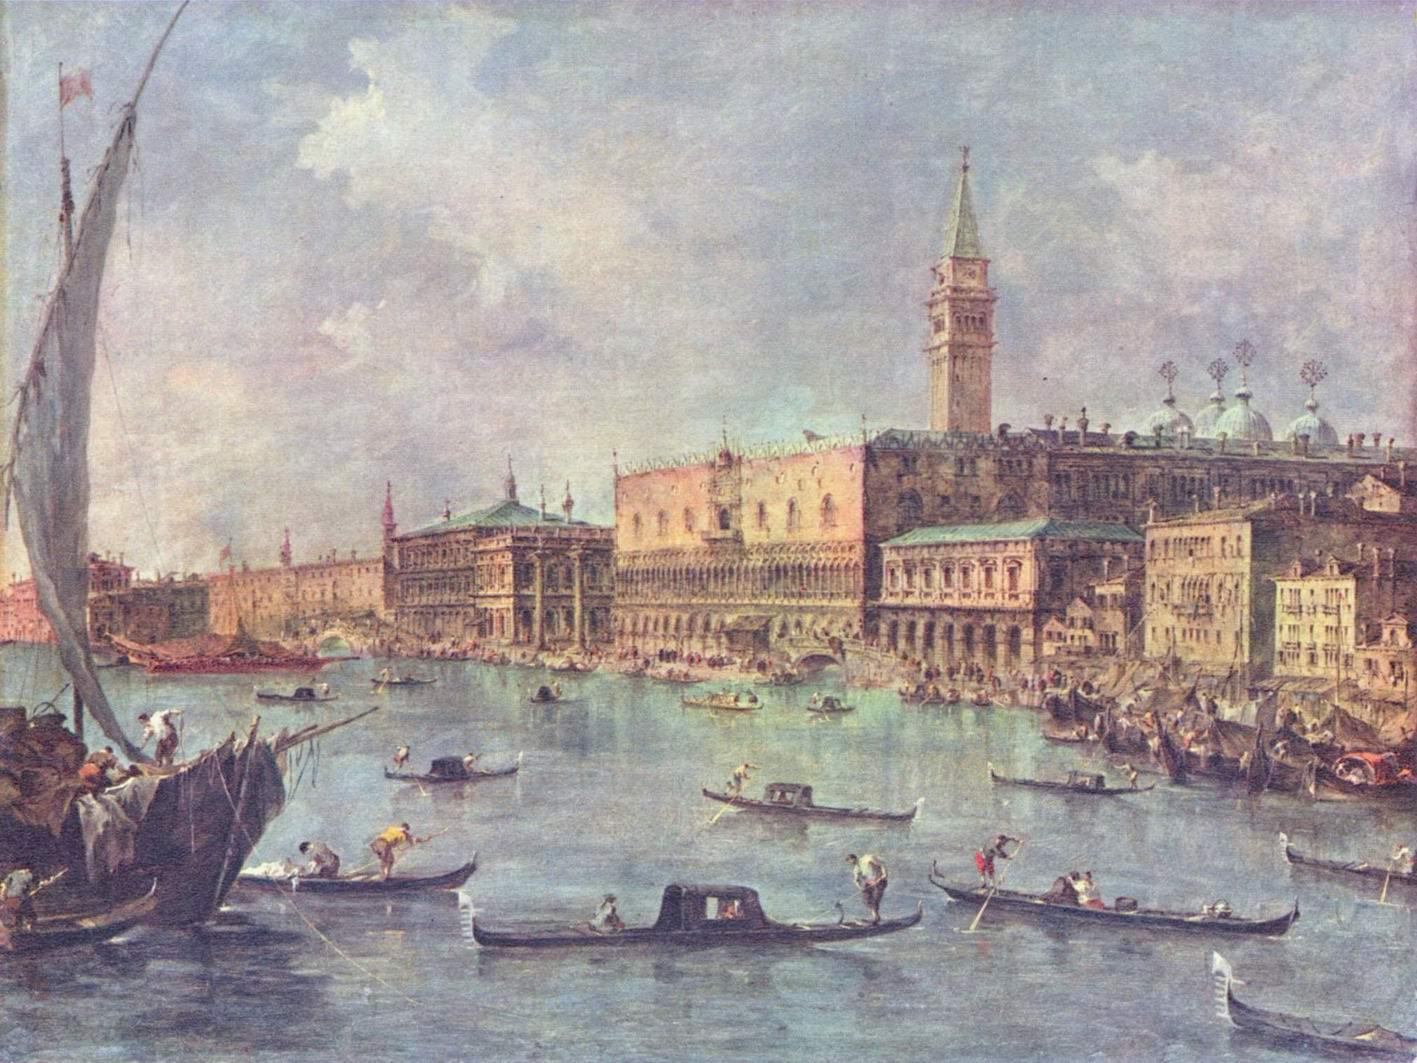 Дворец Дожей в Венеции, Франческо Гварди